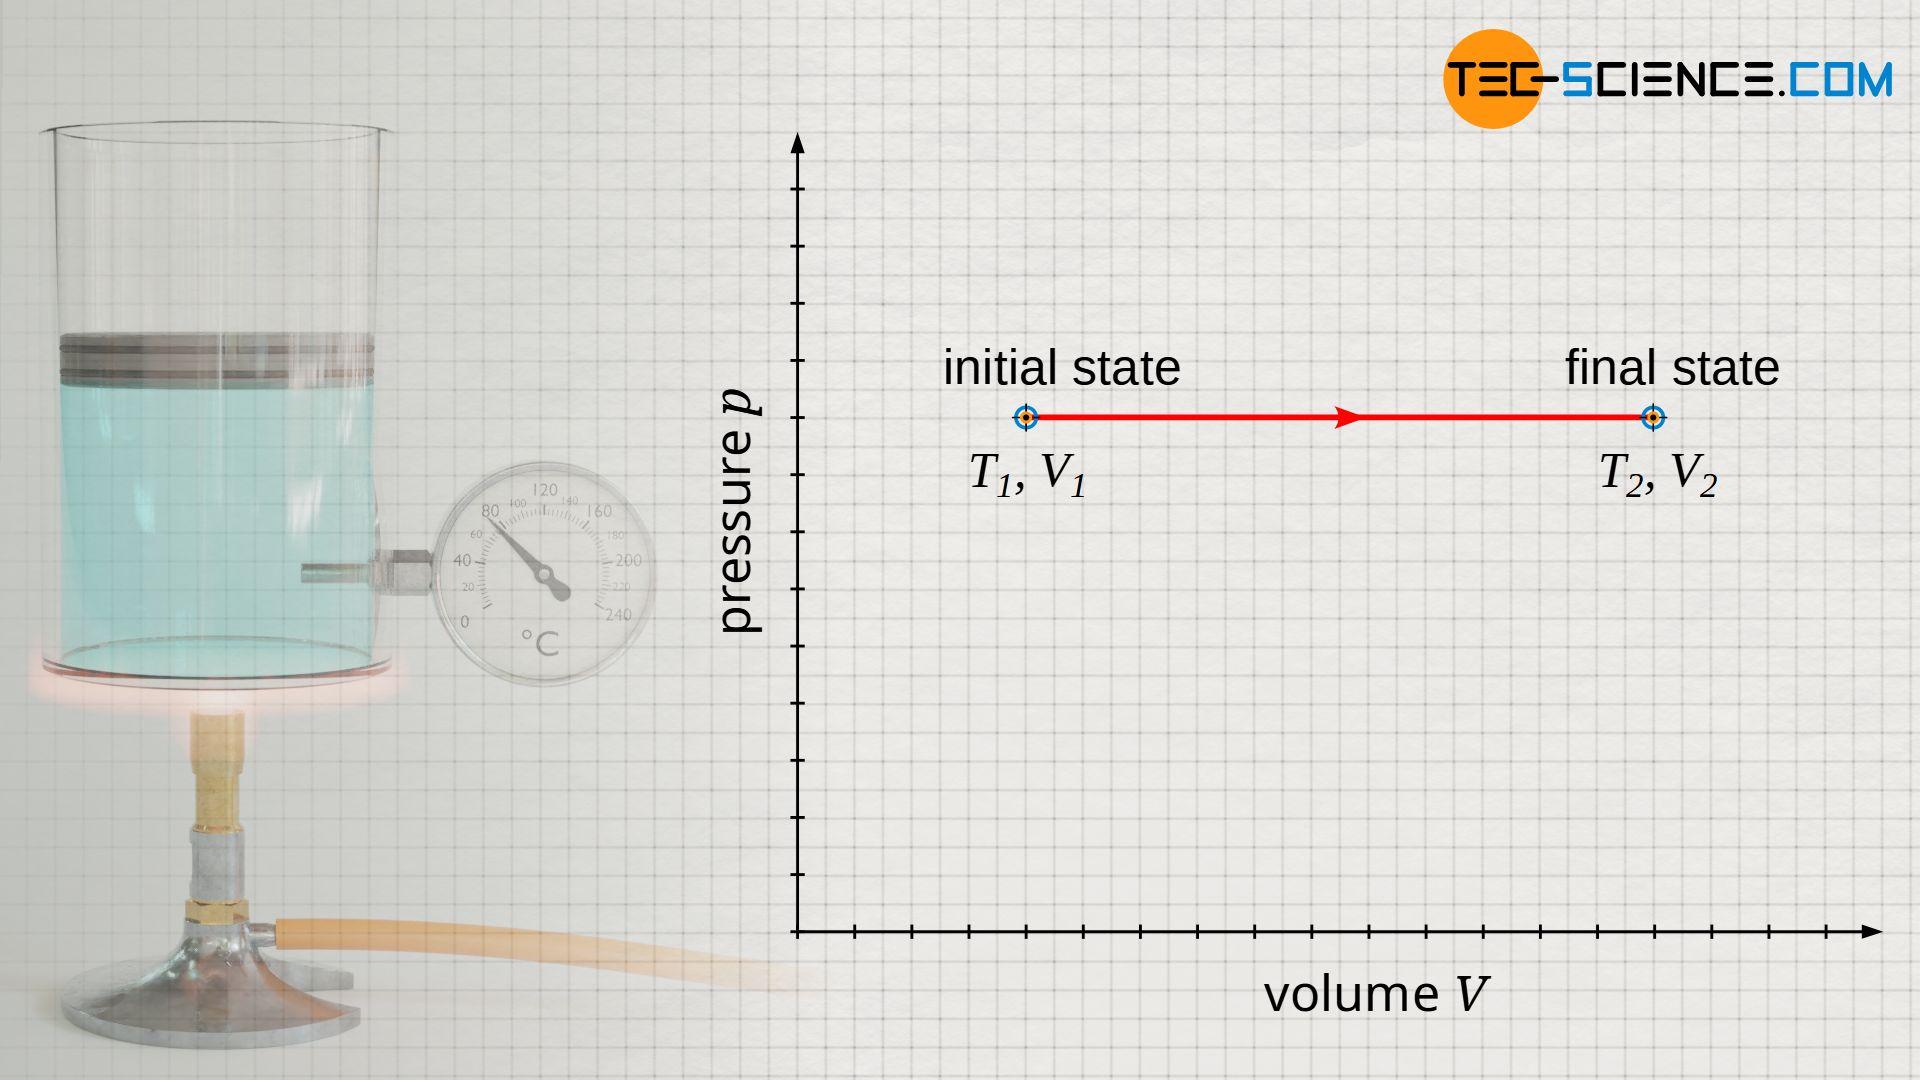 Isobaric process in volume-pressure diagram (constant pressure)